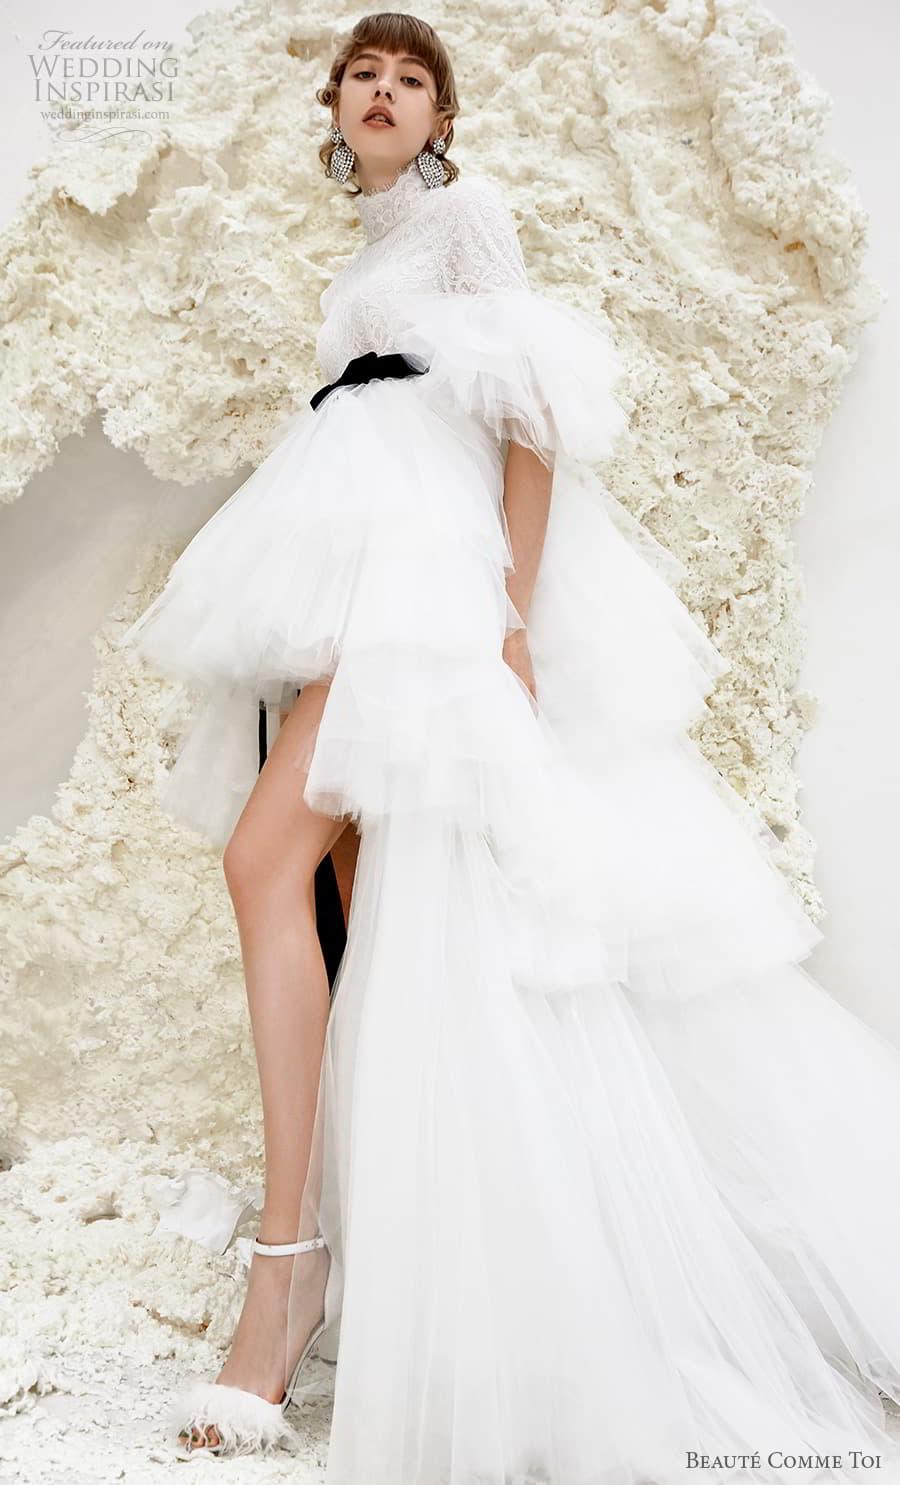 beaute comme toi spring 2022 bridal half poet sleeves high neck heavily embellished bodice short wedding dress a line overskirt covered lace back chapel train (karrisa) sv